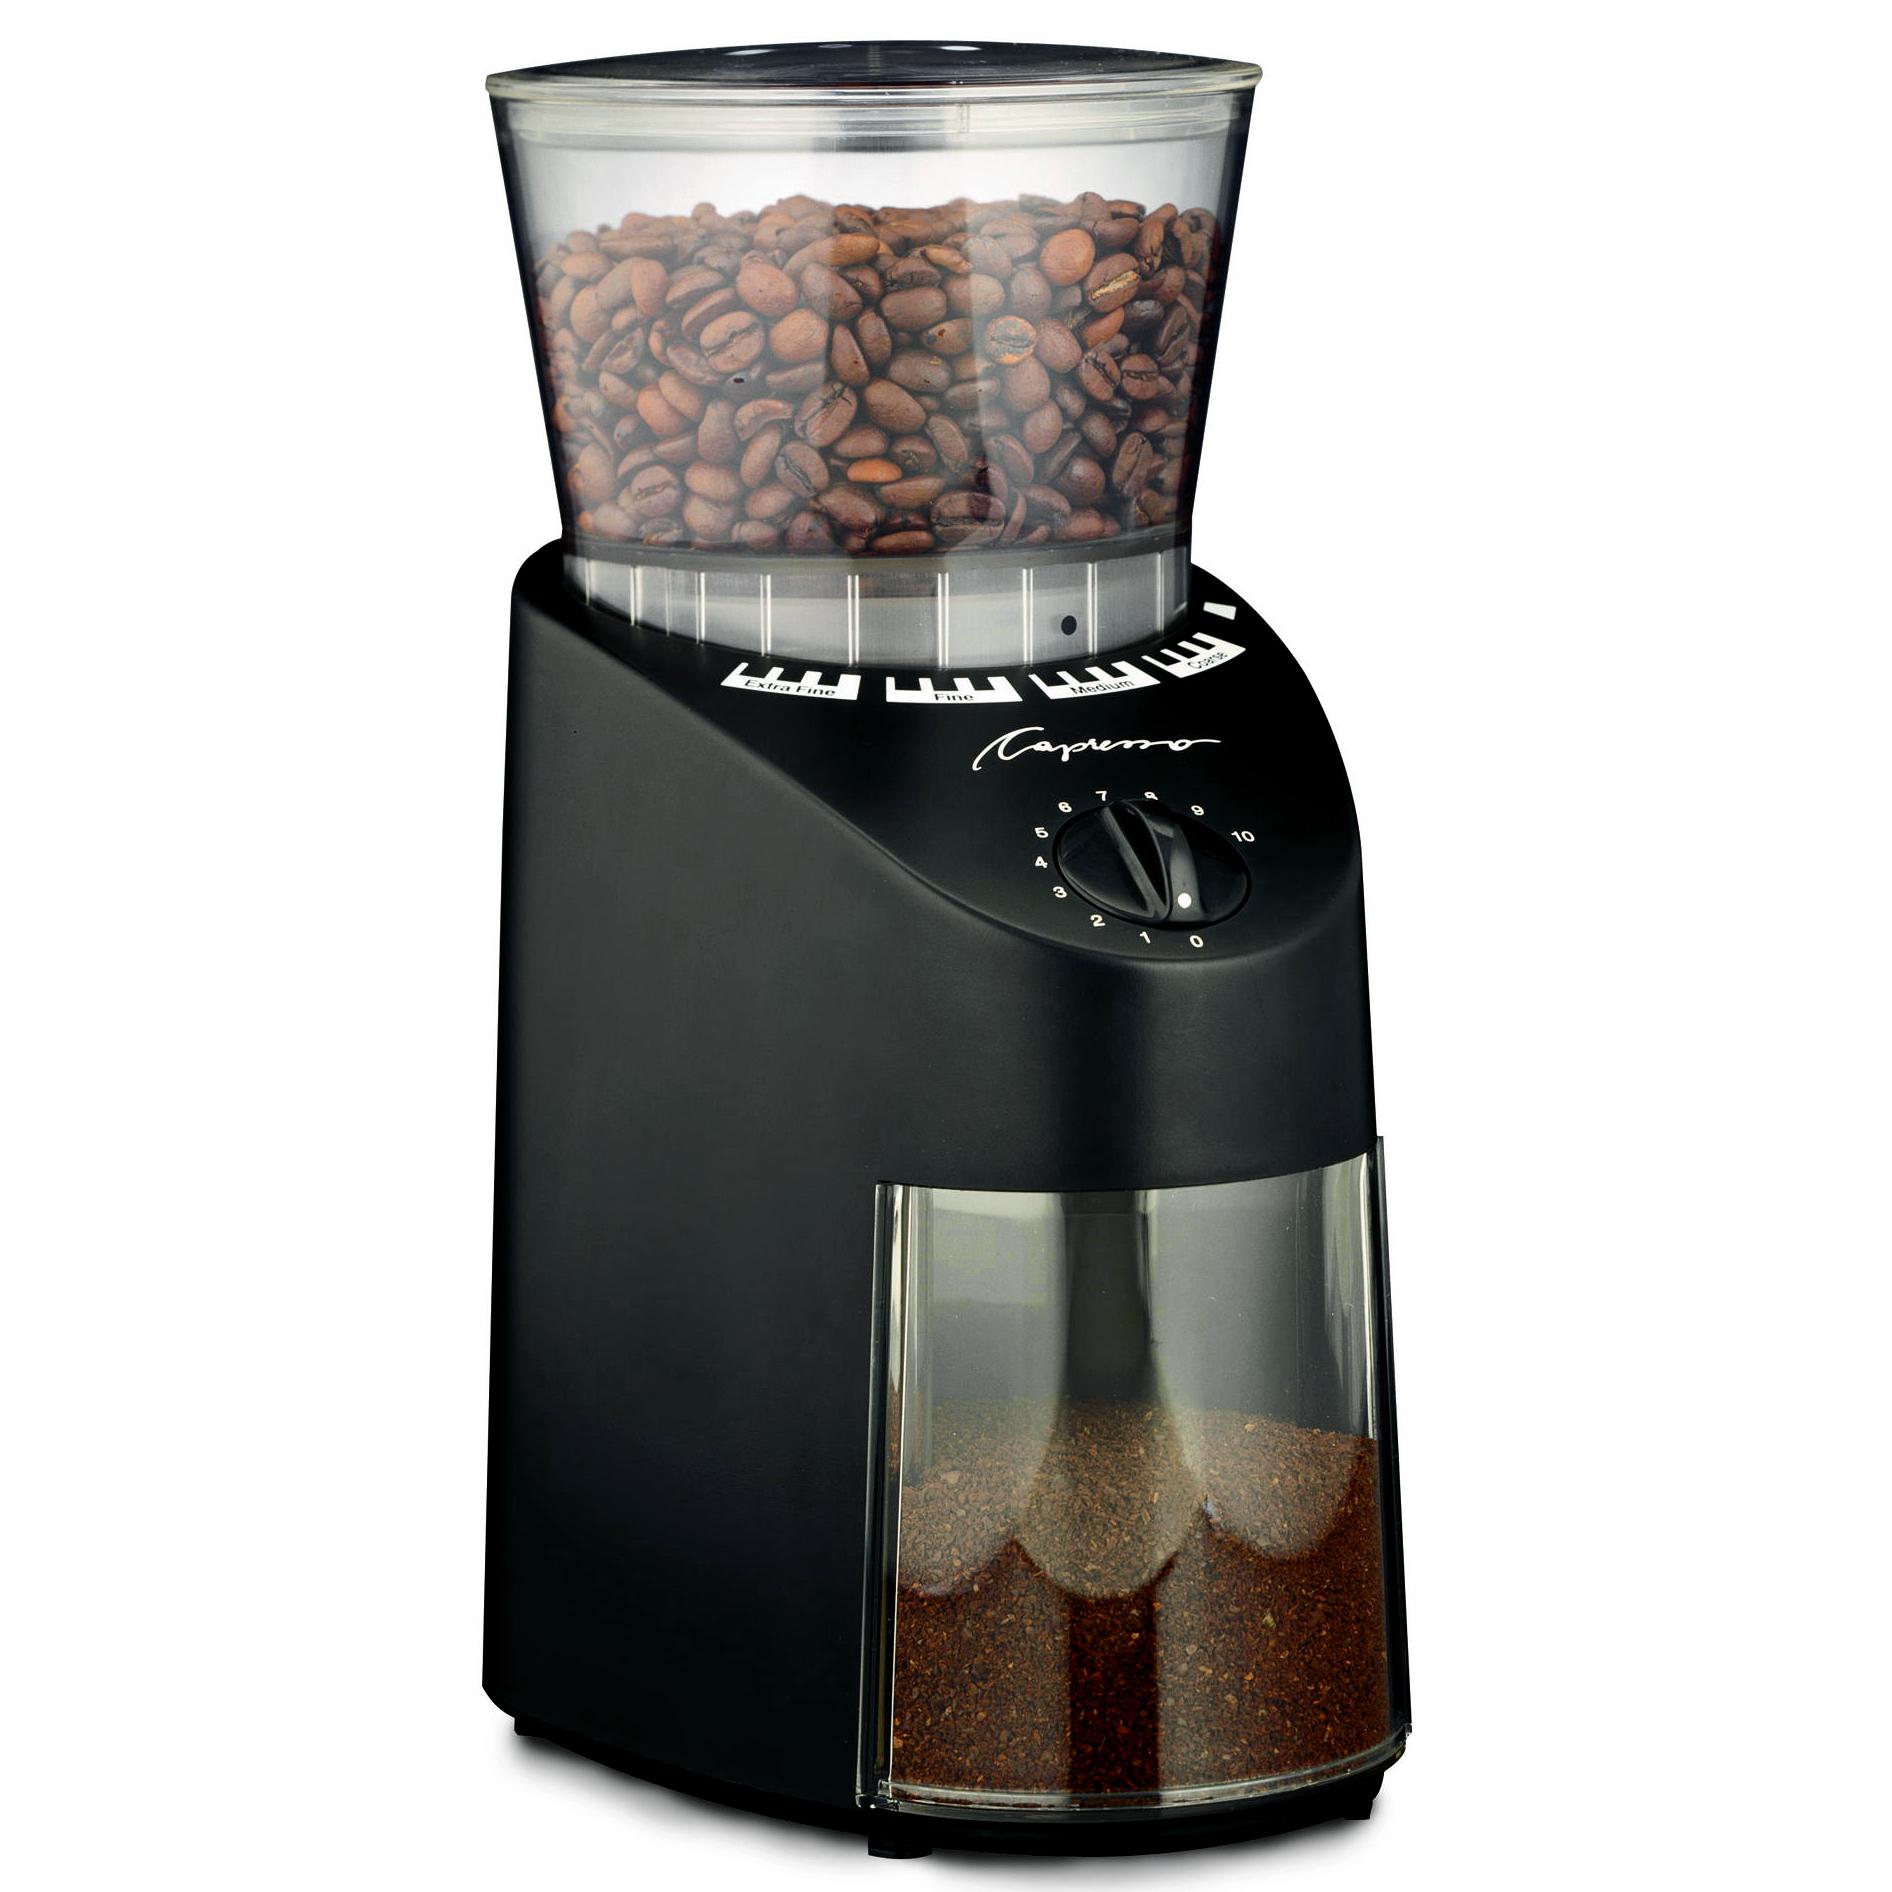 Capresso Black Finish Infinity Burr Coffee Grinder